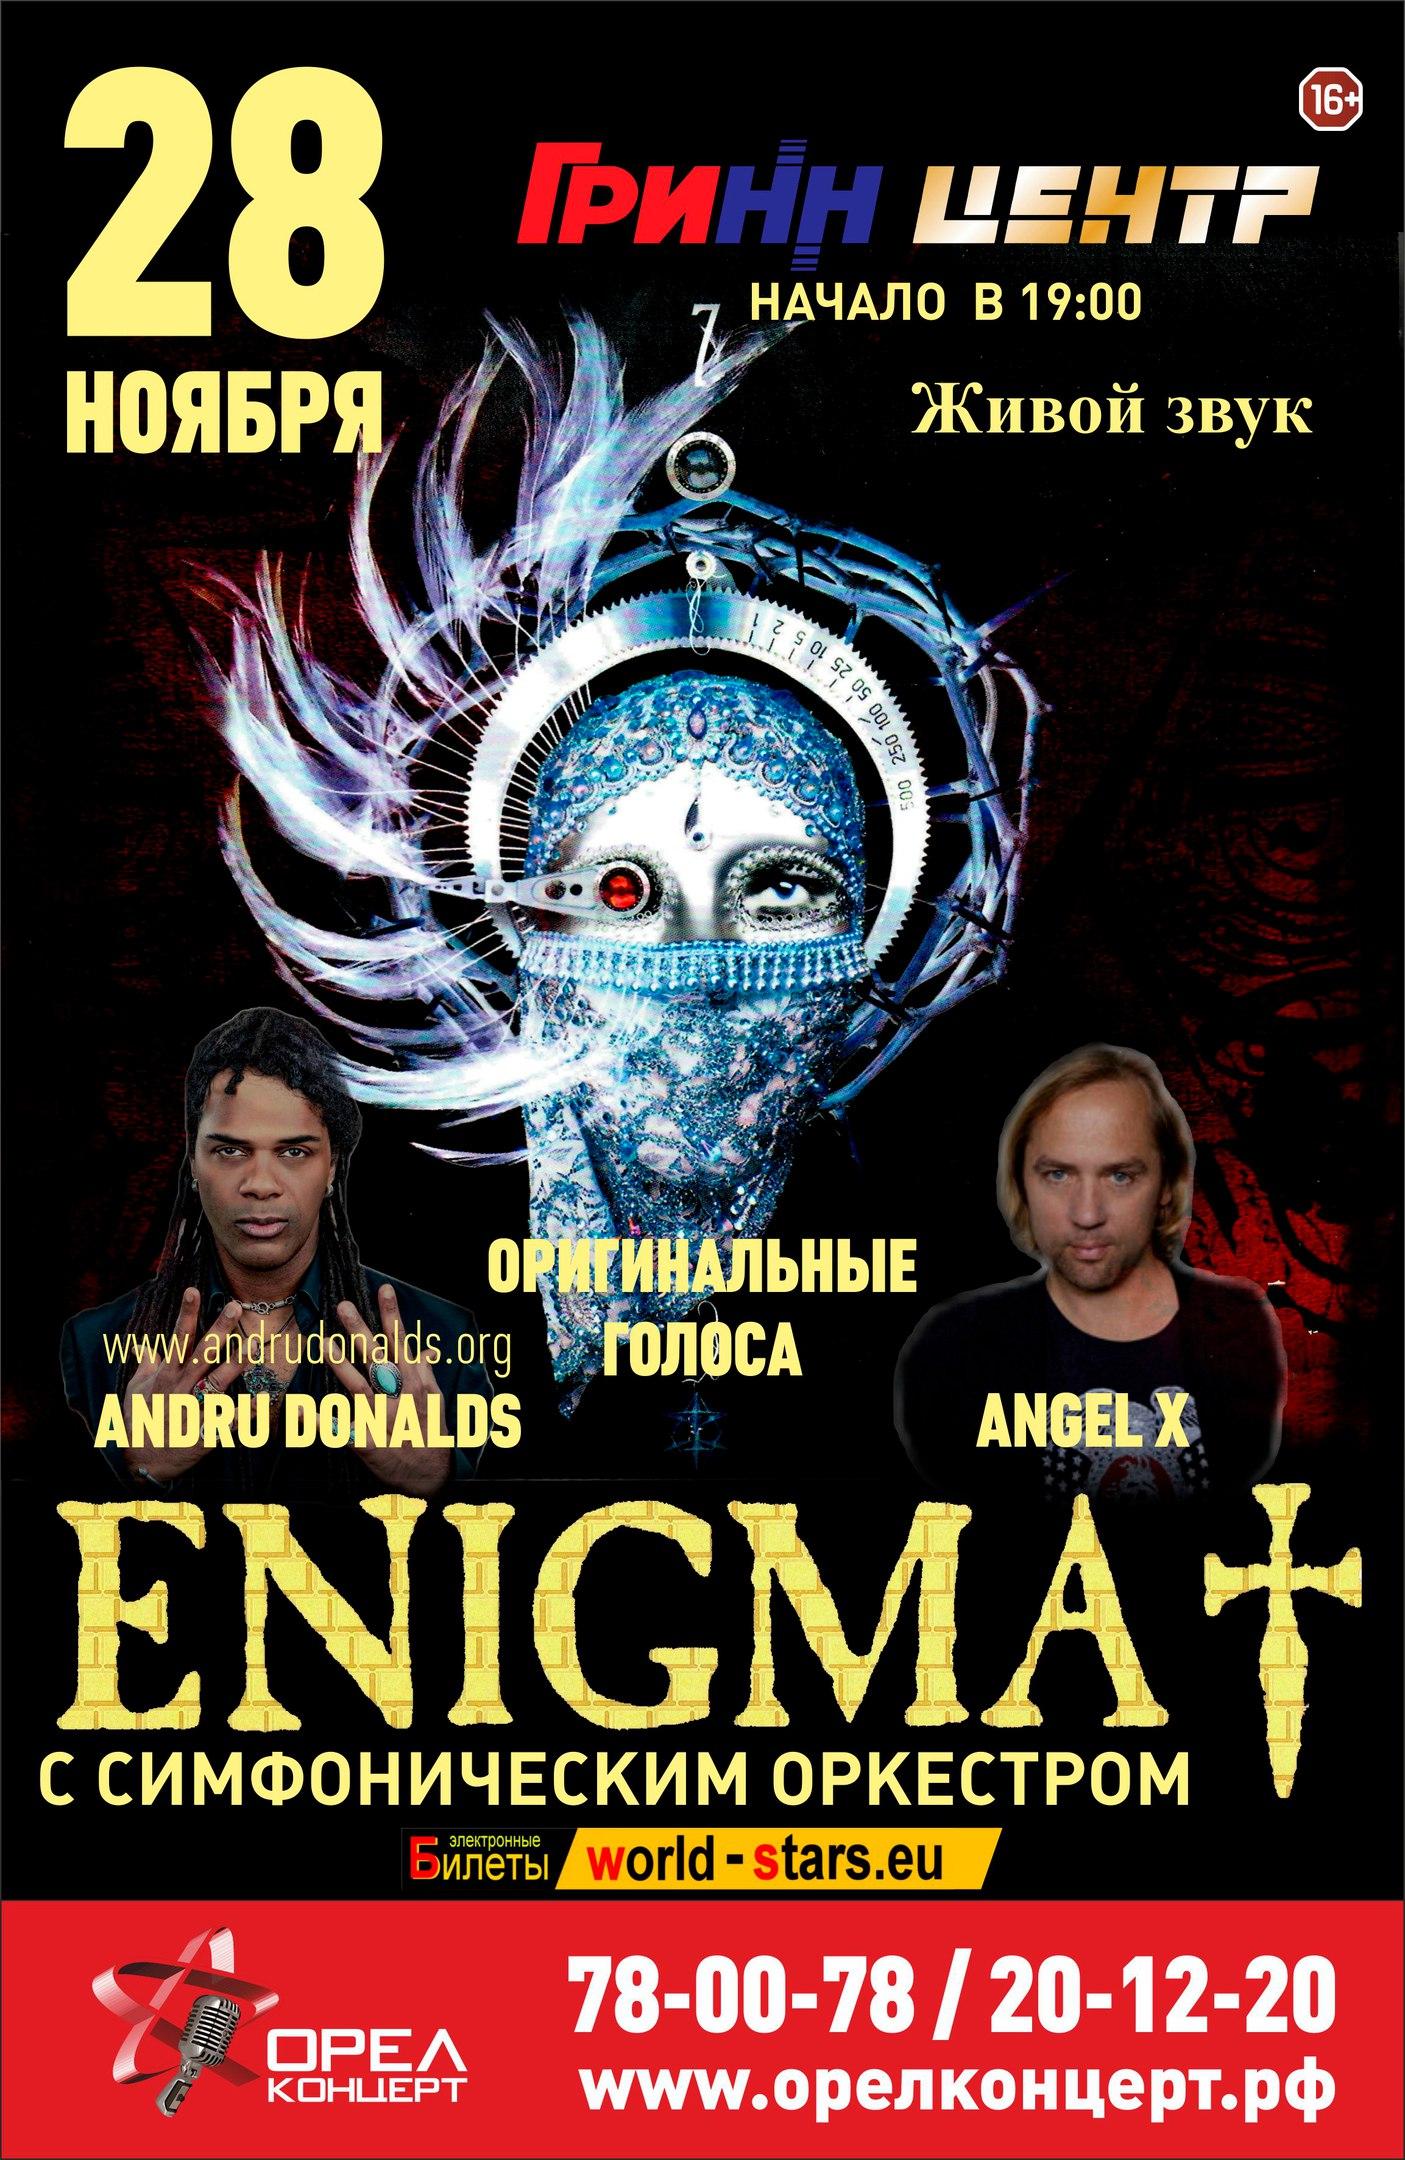 Enigma с симфоническим оркестром